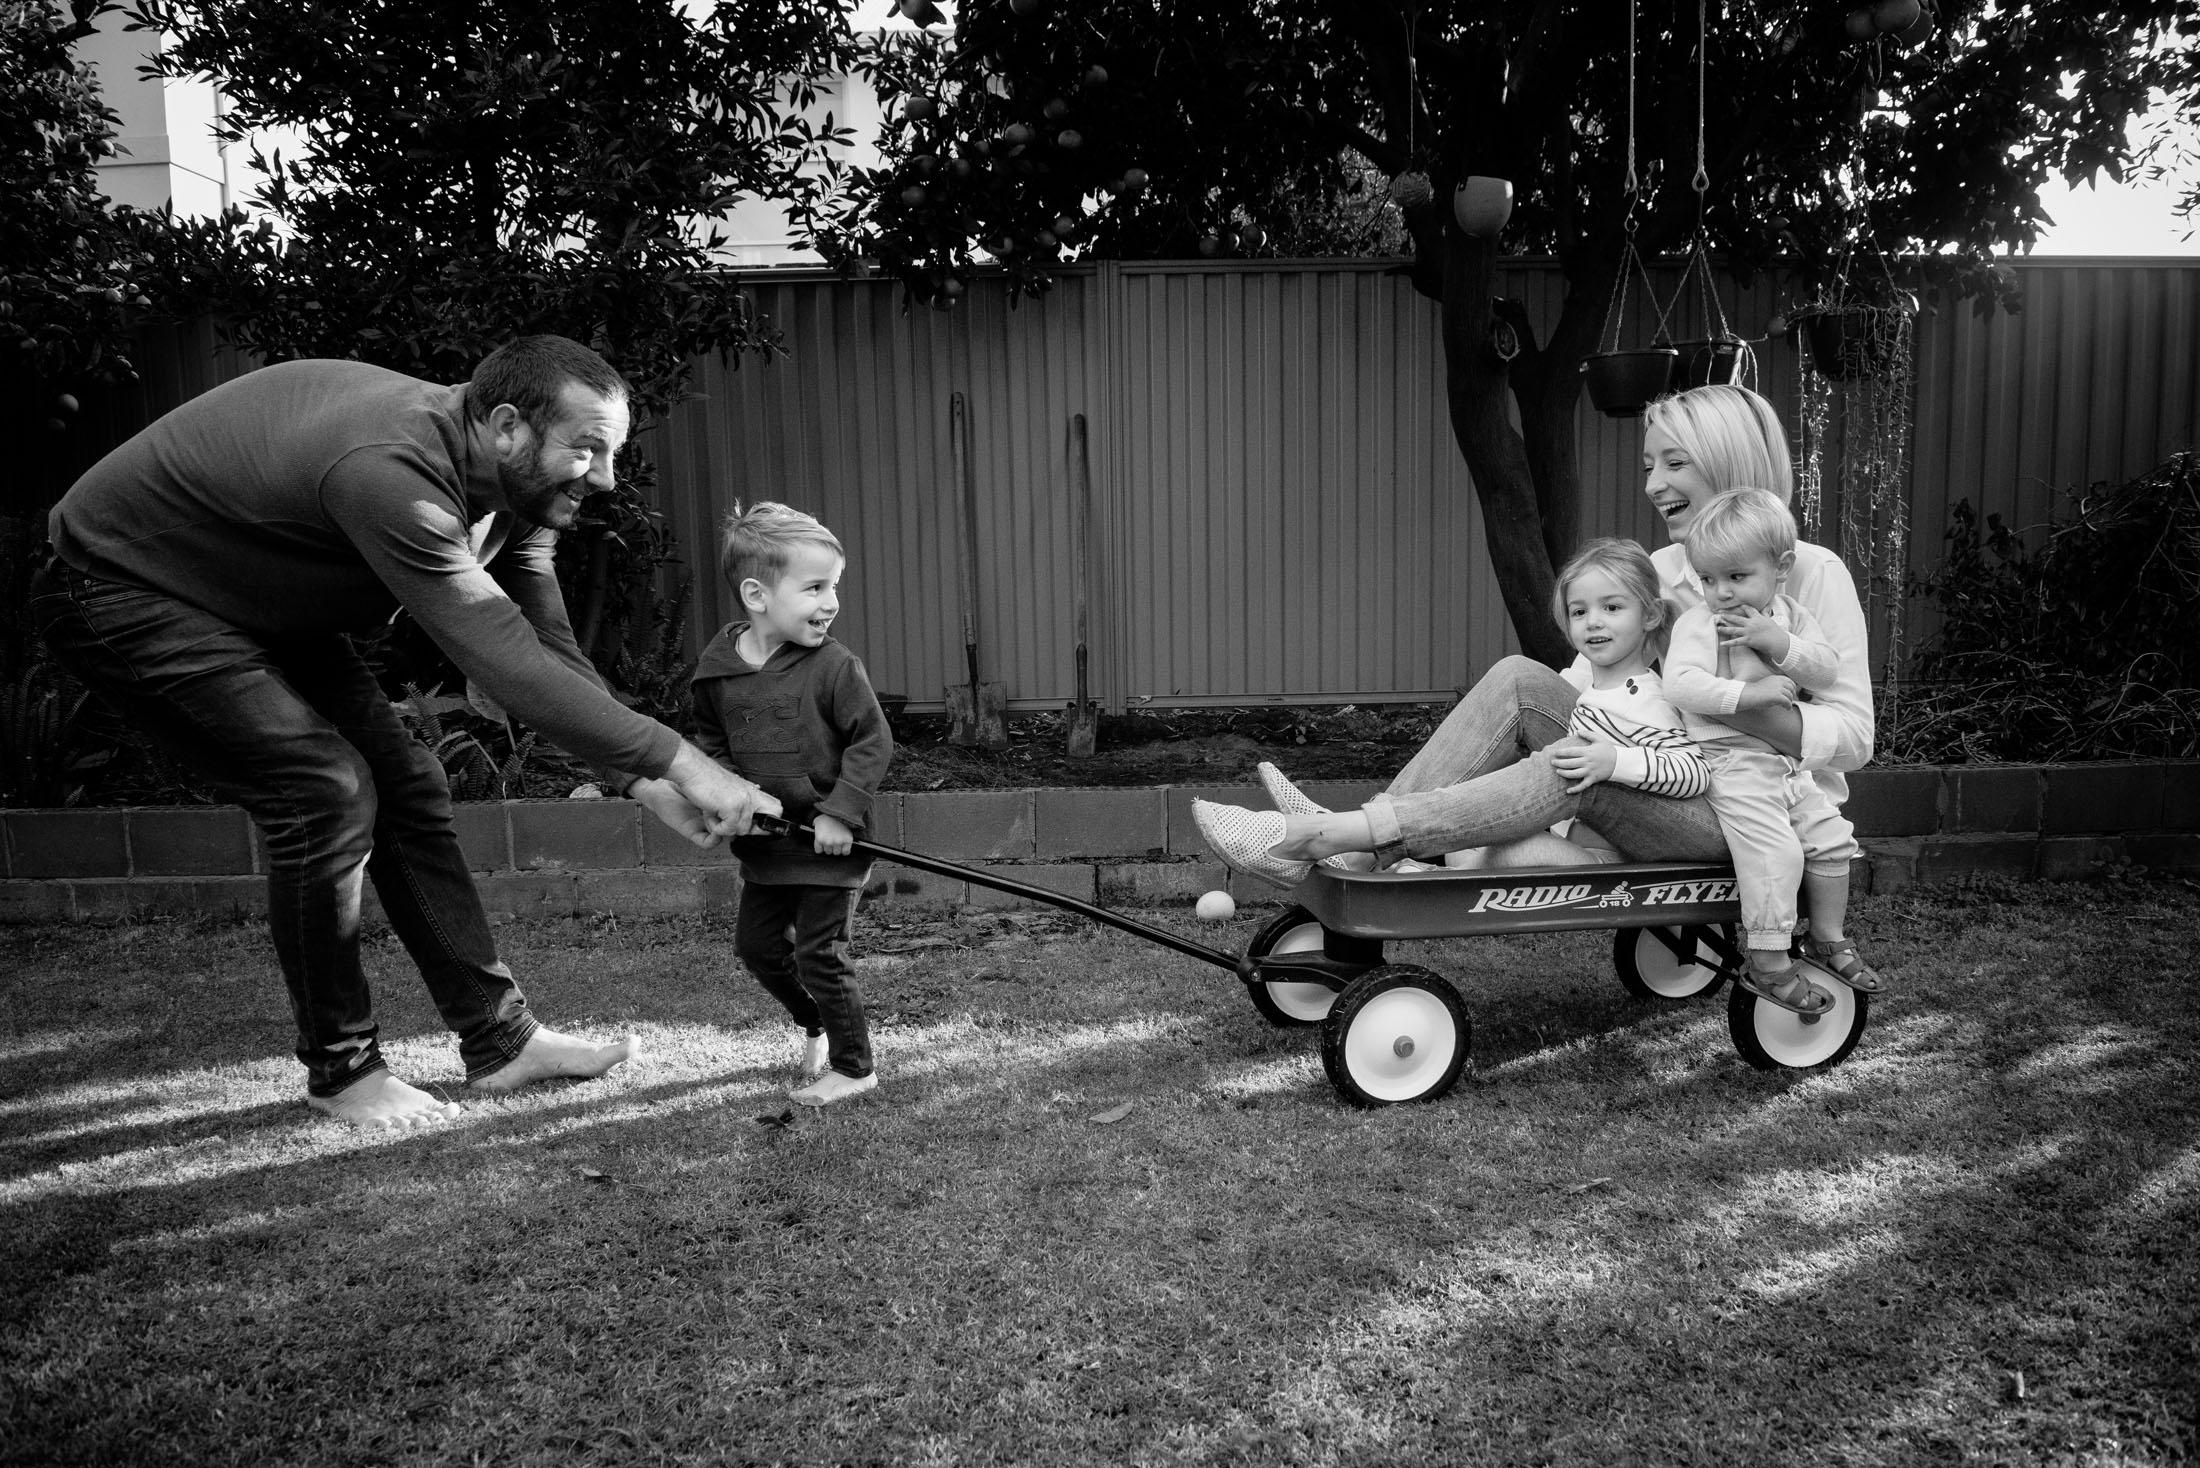 Laing_Family-Photography-unposed04.JPG